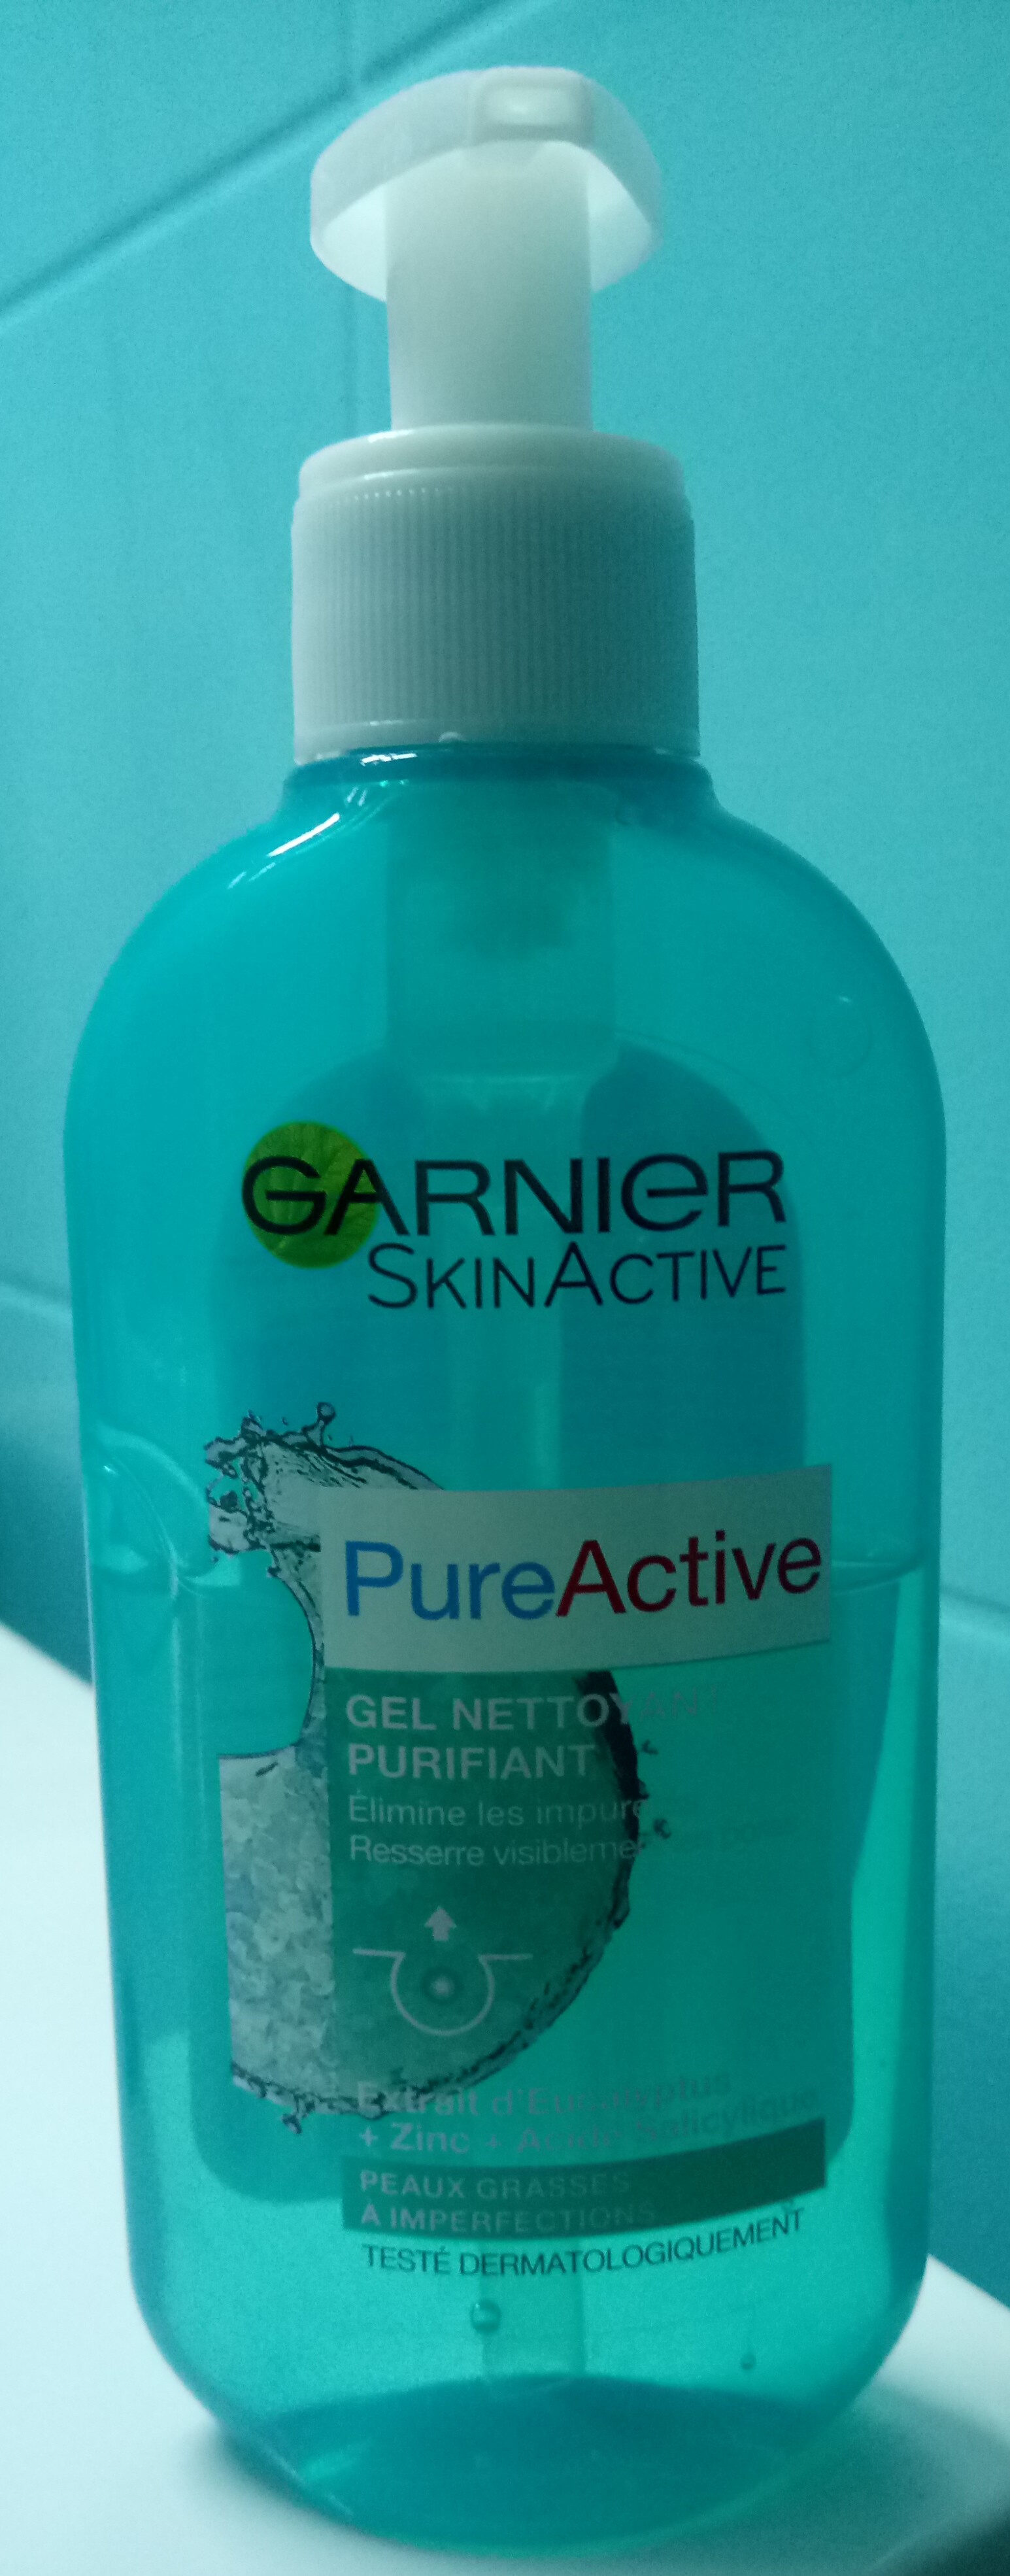 Pure Active Gel Nettoyant Purifiant - Product